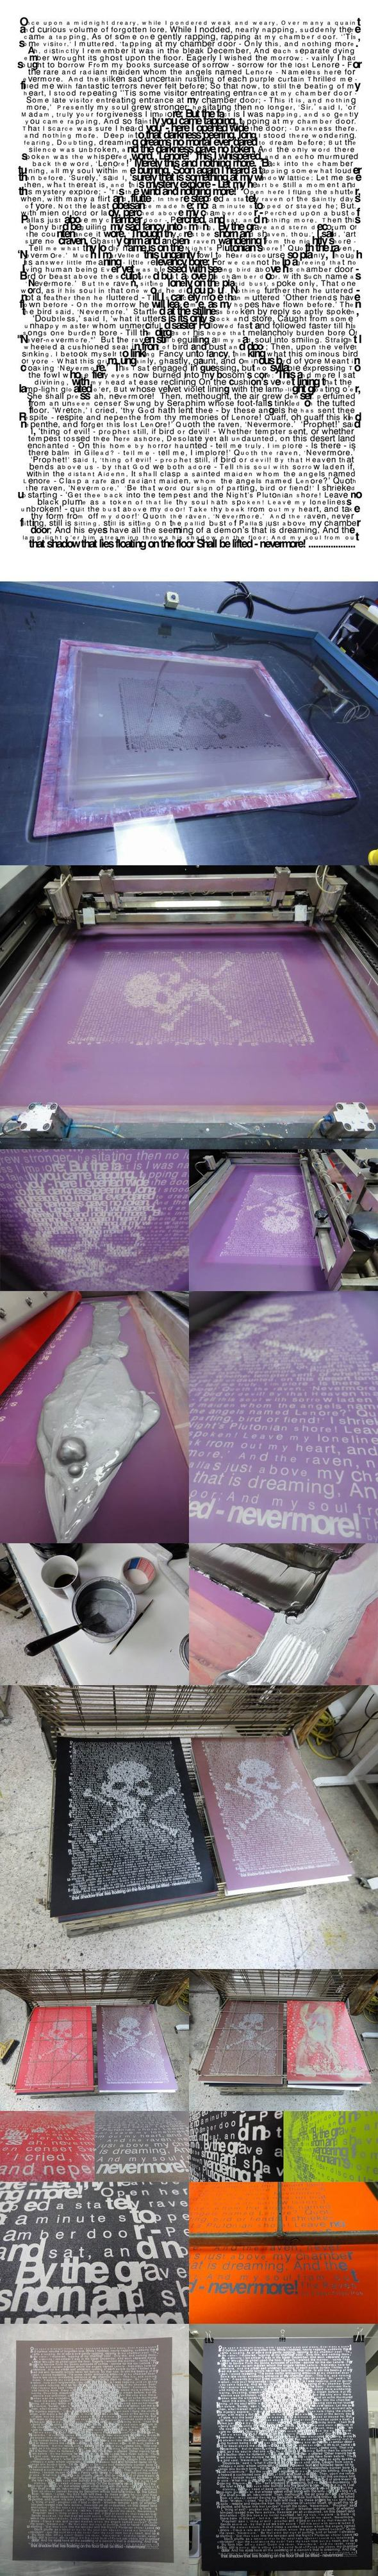 raven silkscreen print by tind-d31bm1s